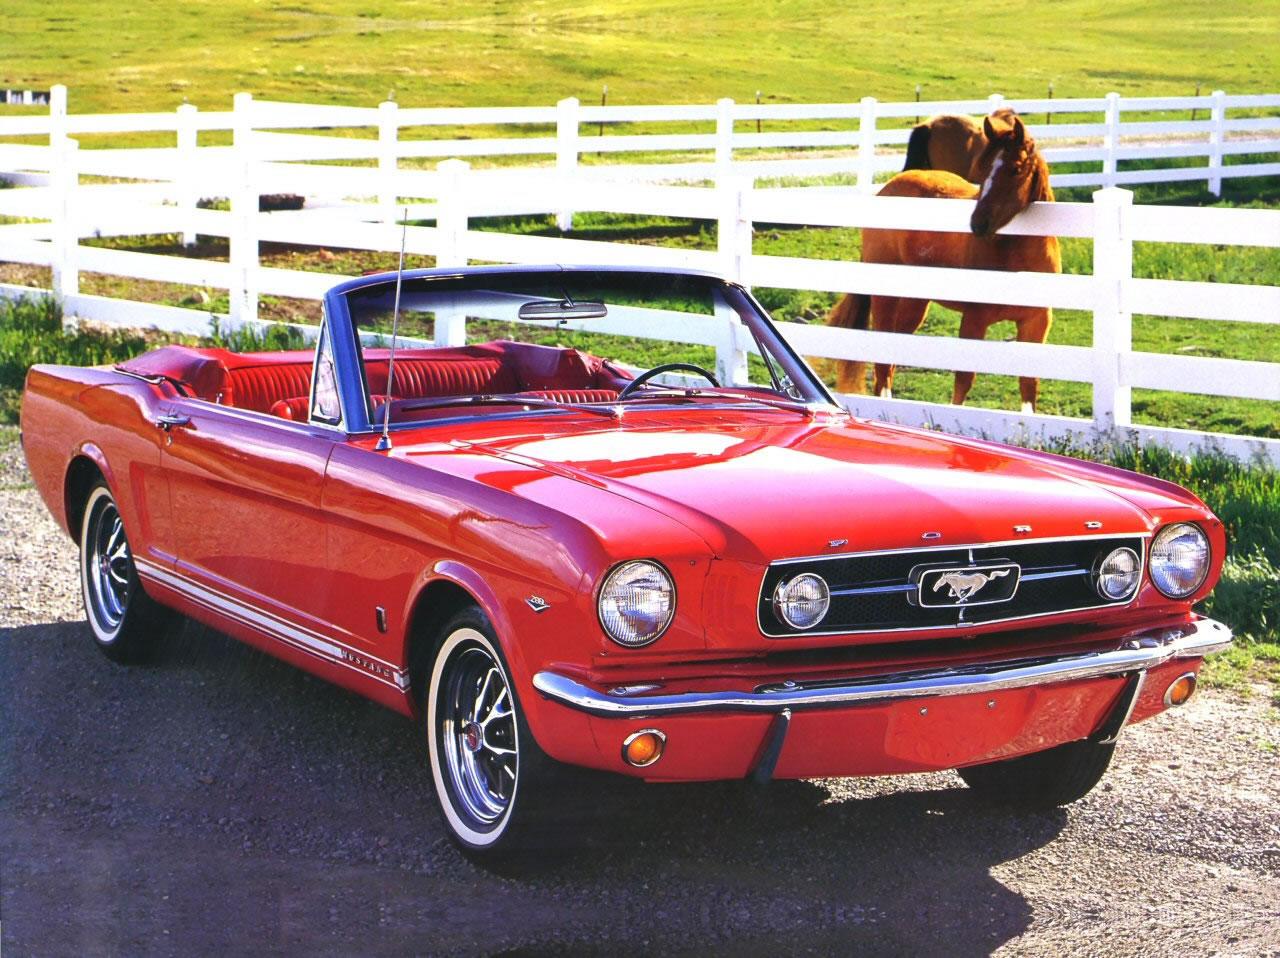 1965 Ford Mustang.jpg